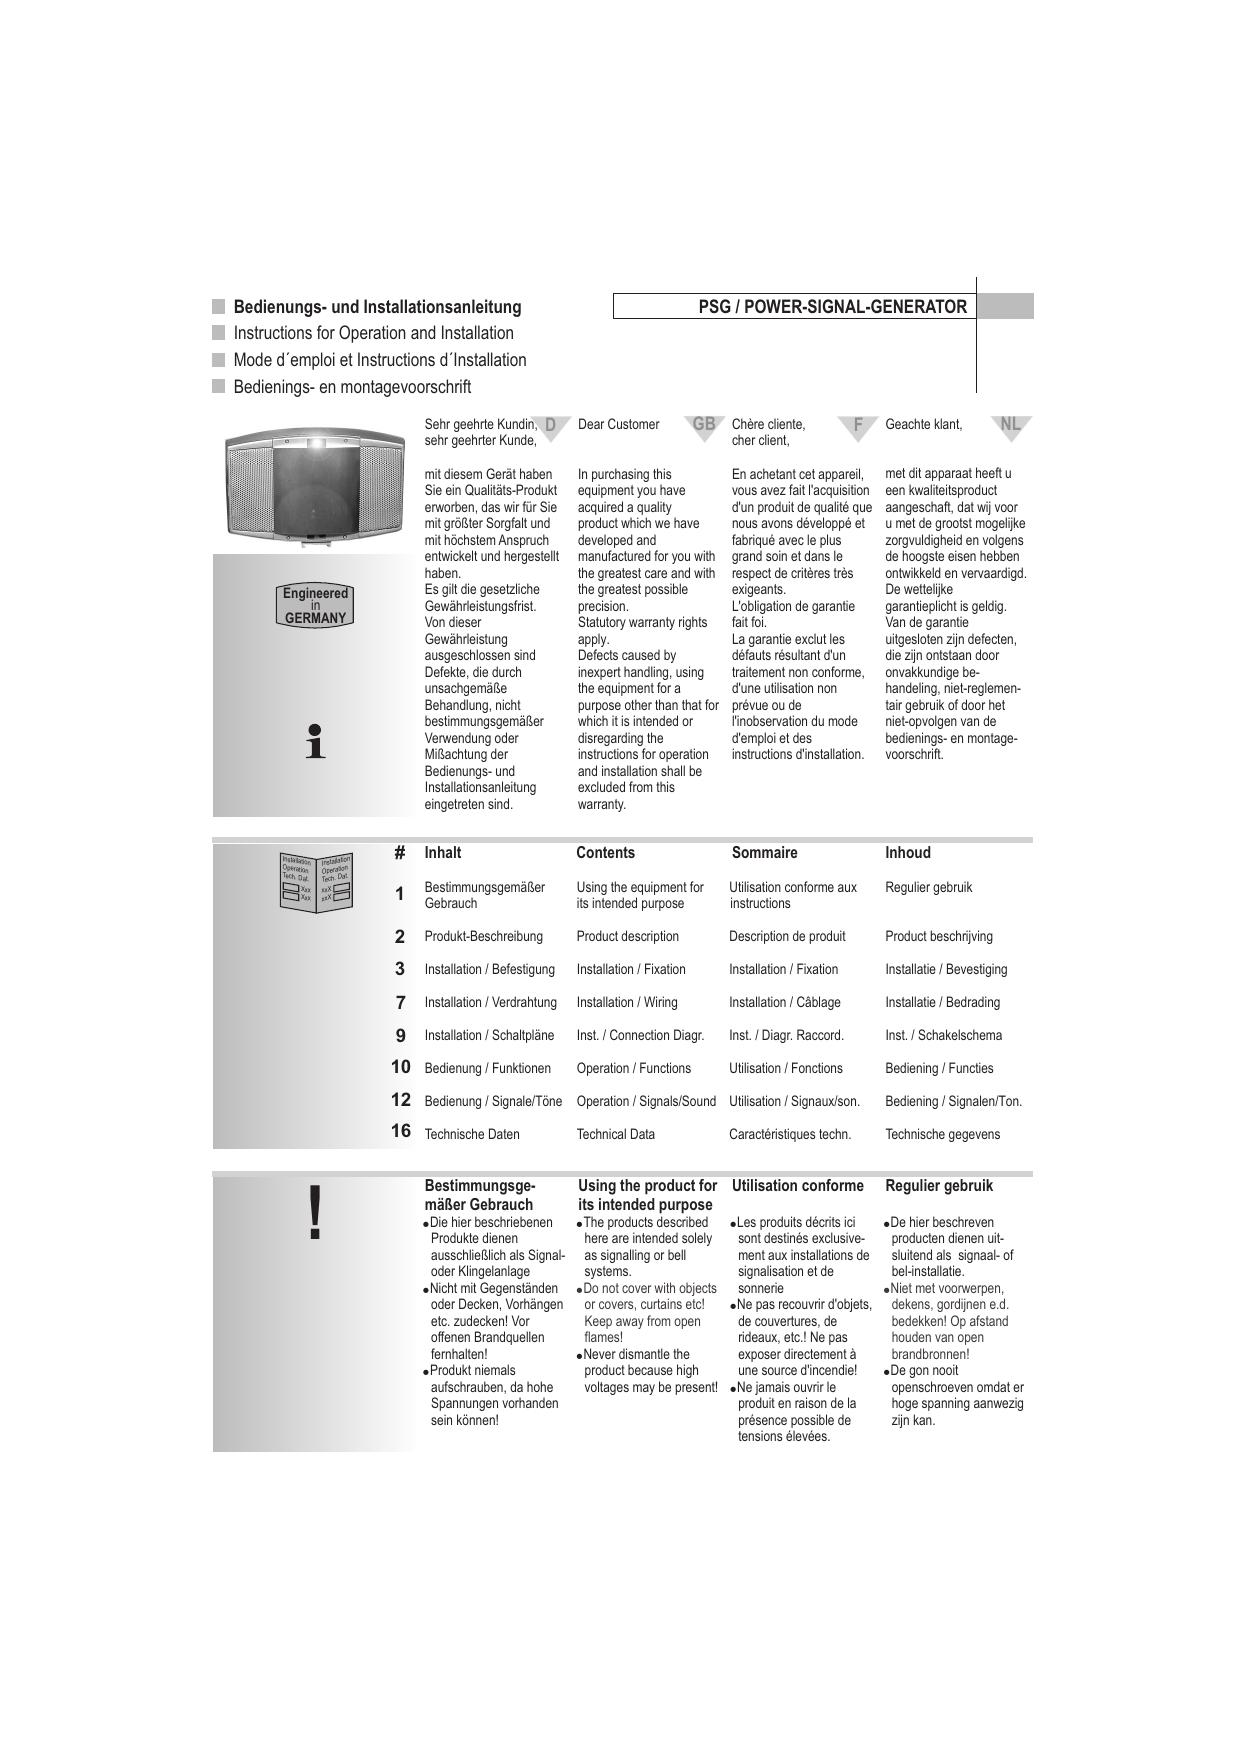 und Installationsanleitung Instructions for Operation | manualzz.com